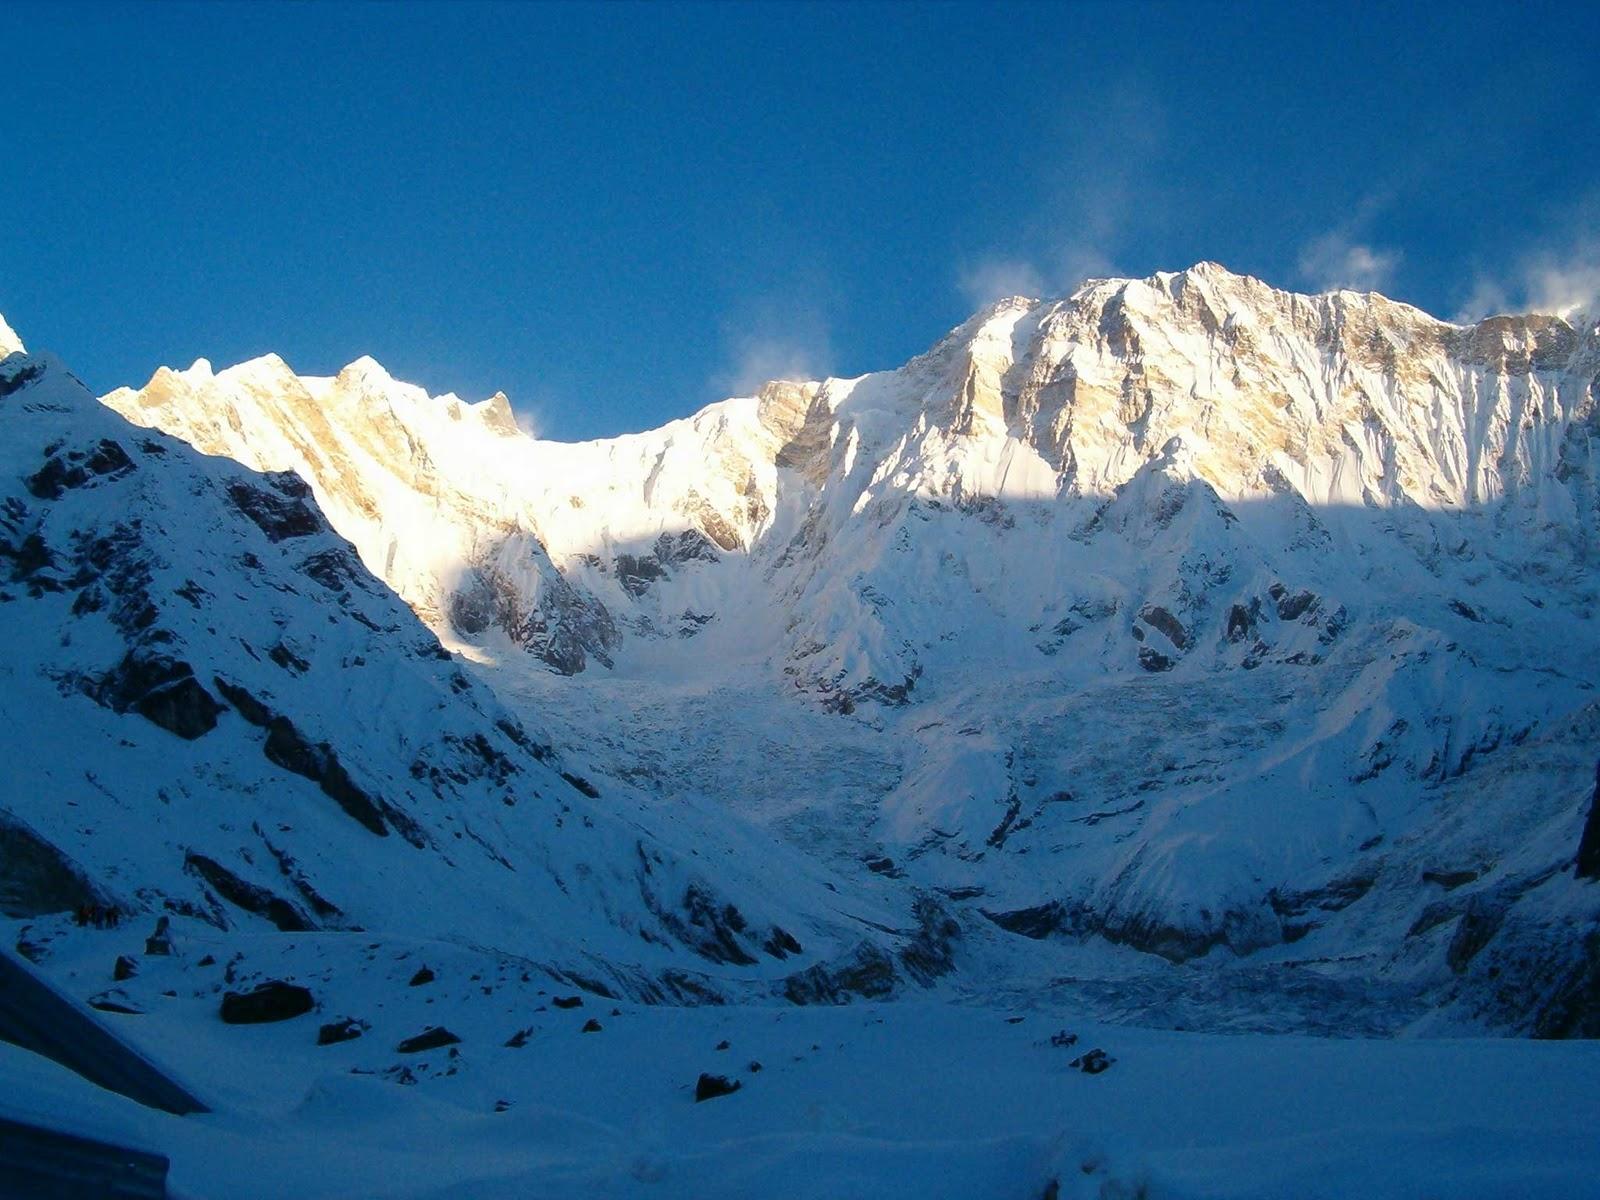 PicturesPool Beautiful Mountain Wallpapers  Himalayas 1600x1200